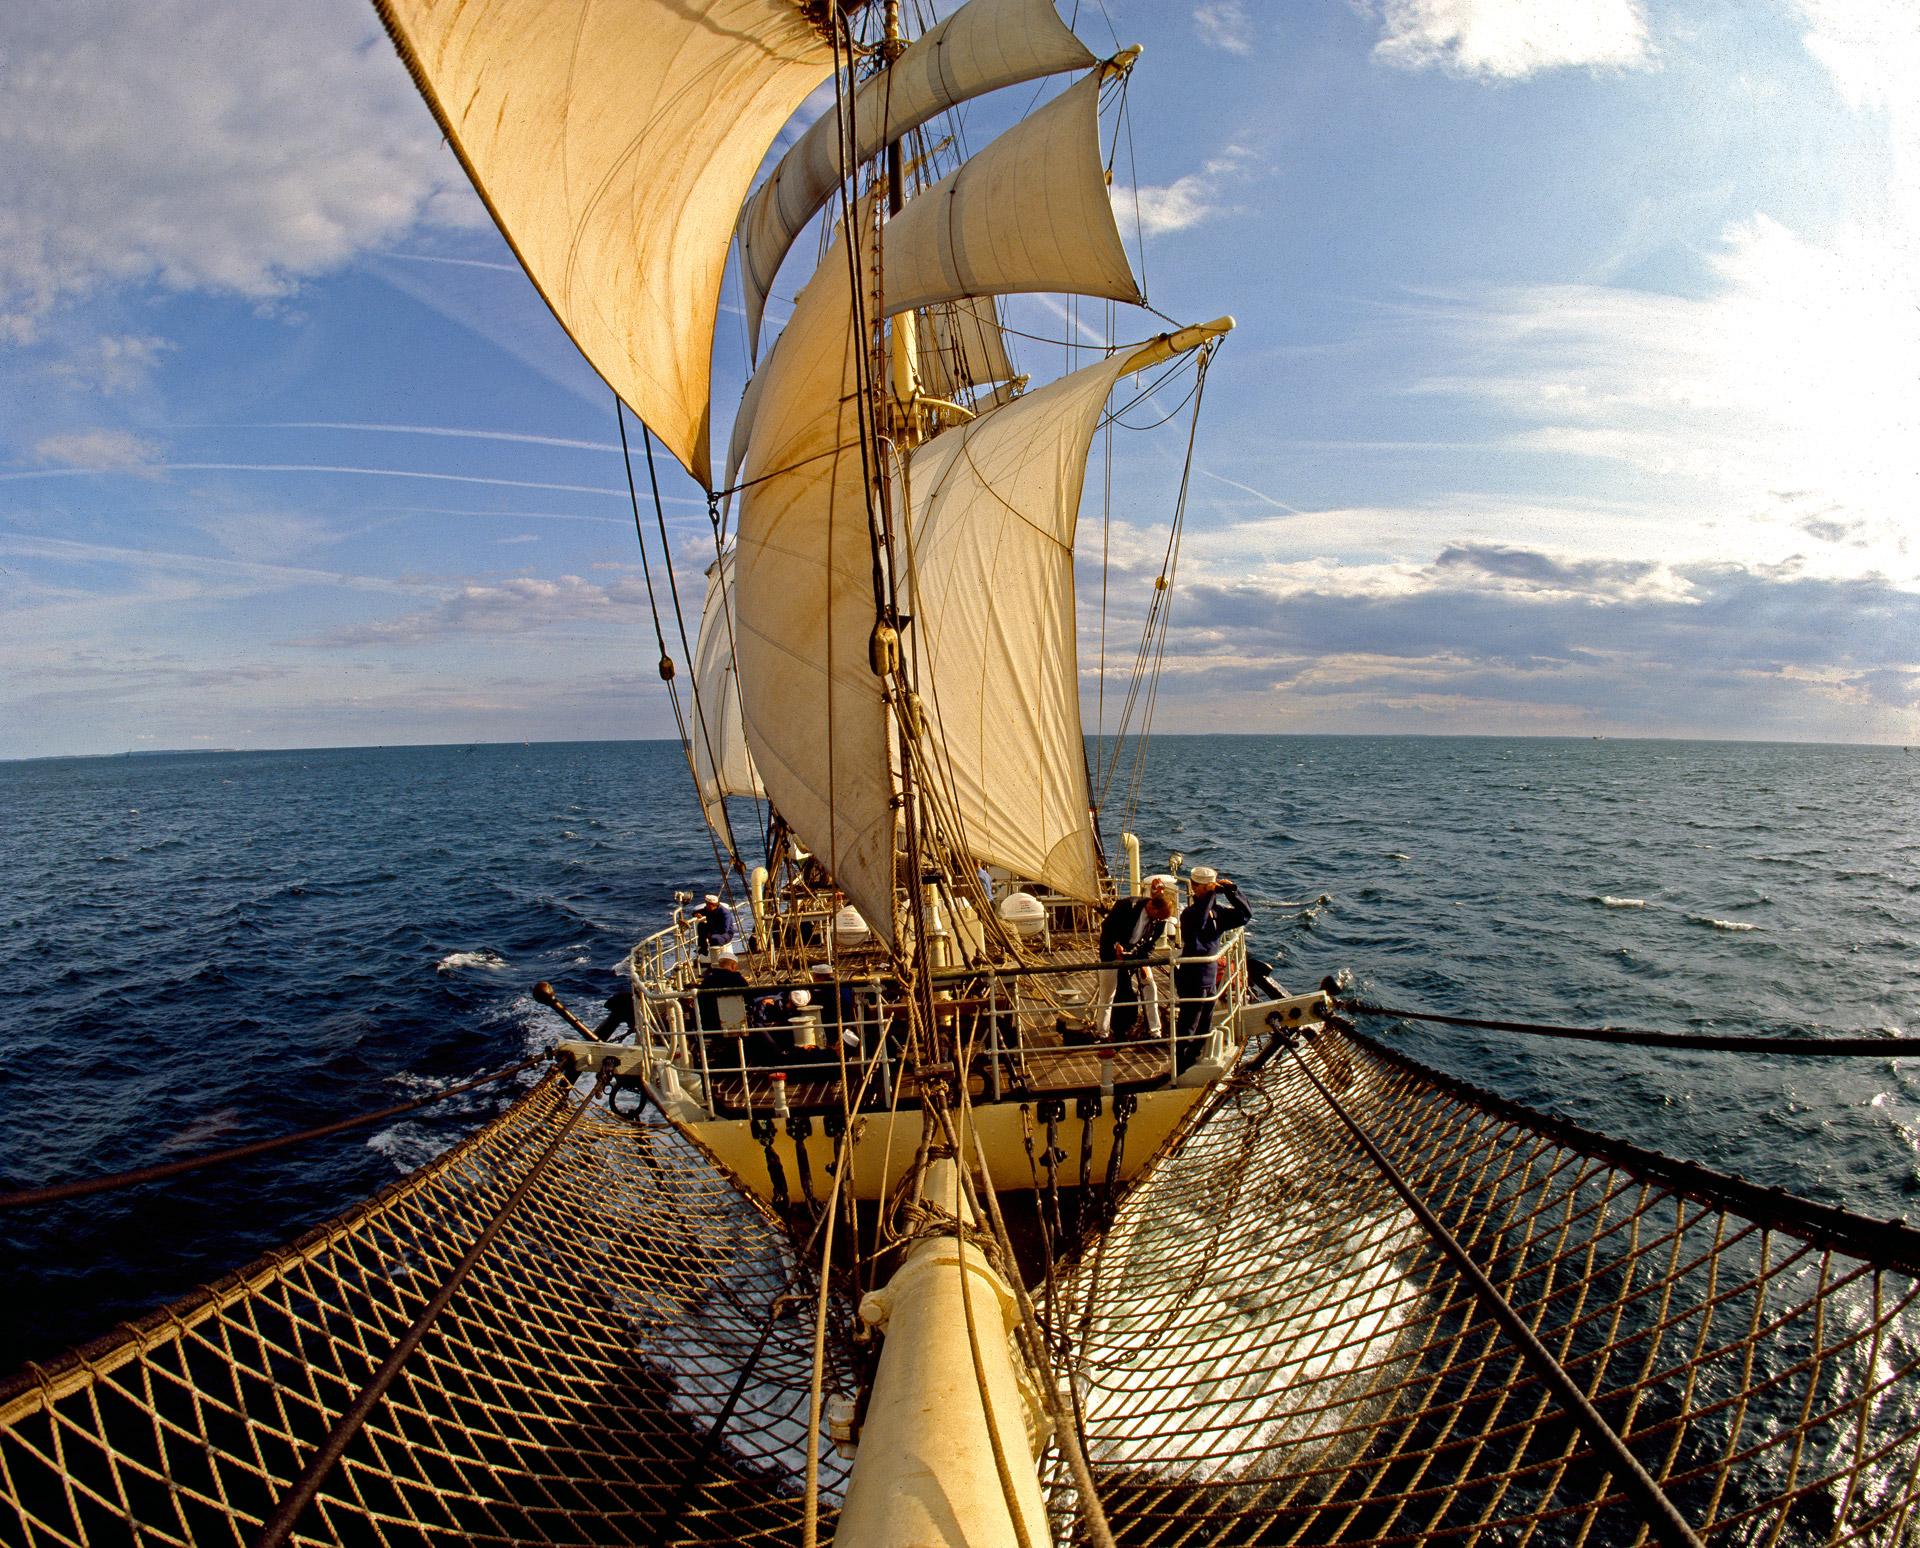 Skoleskibet Danmark - the school ship Denmark